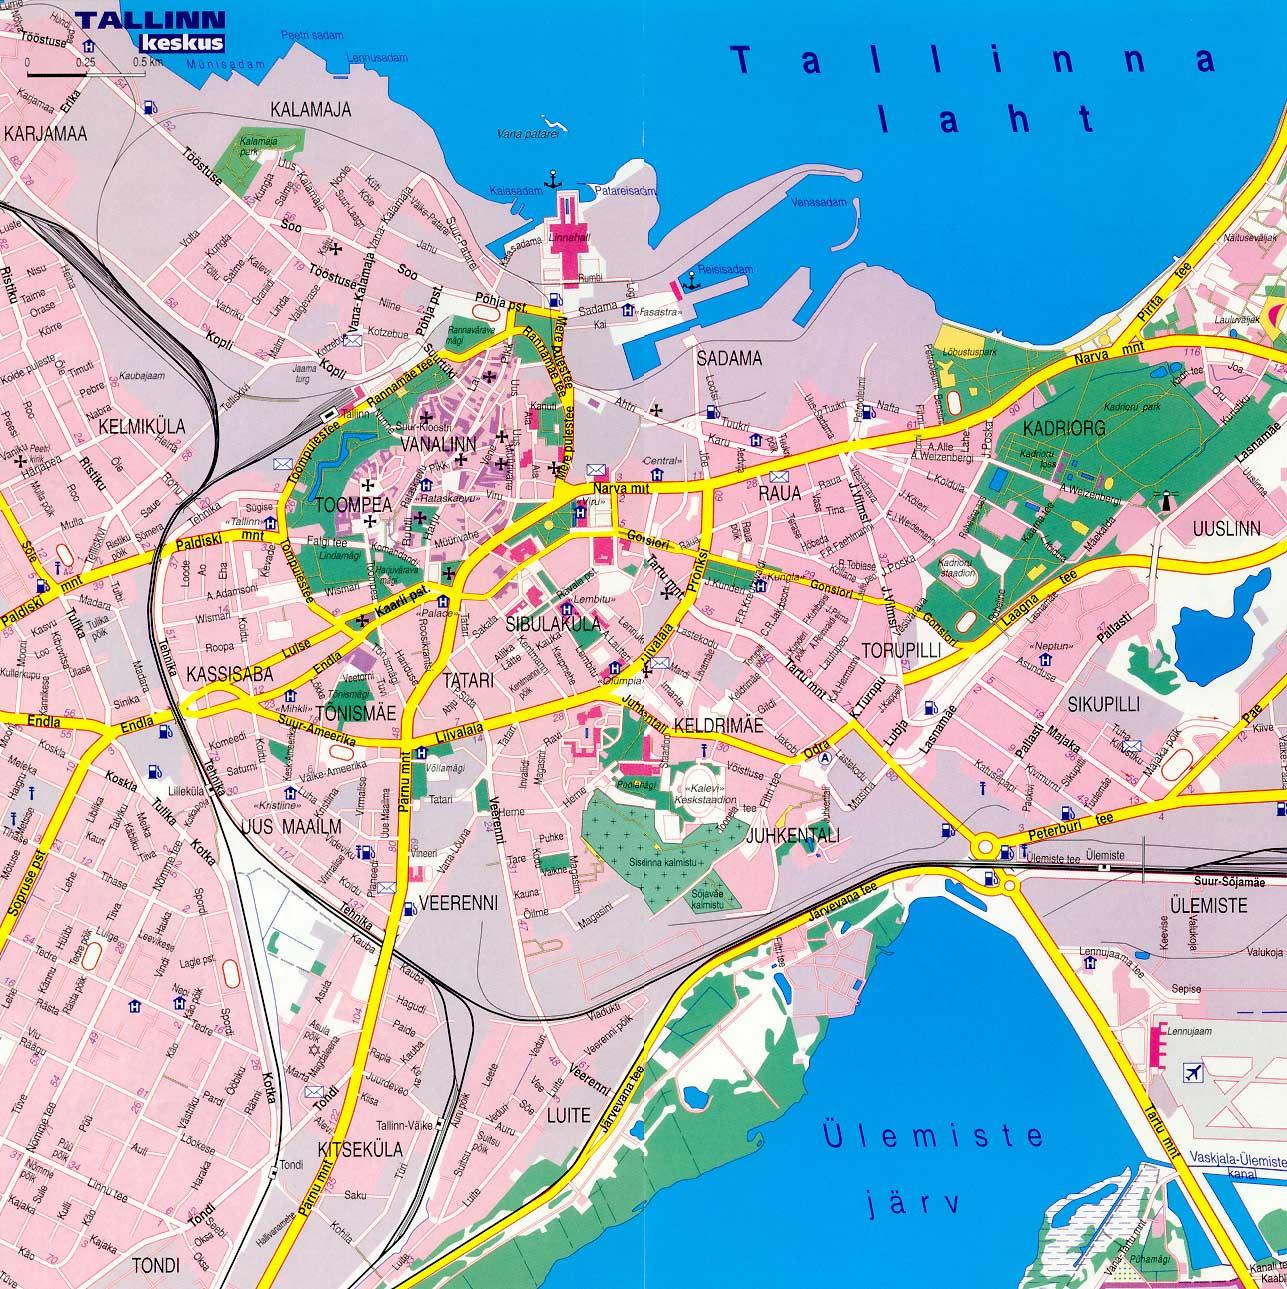 Mapa Grande de Tallinn, Estónia 1